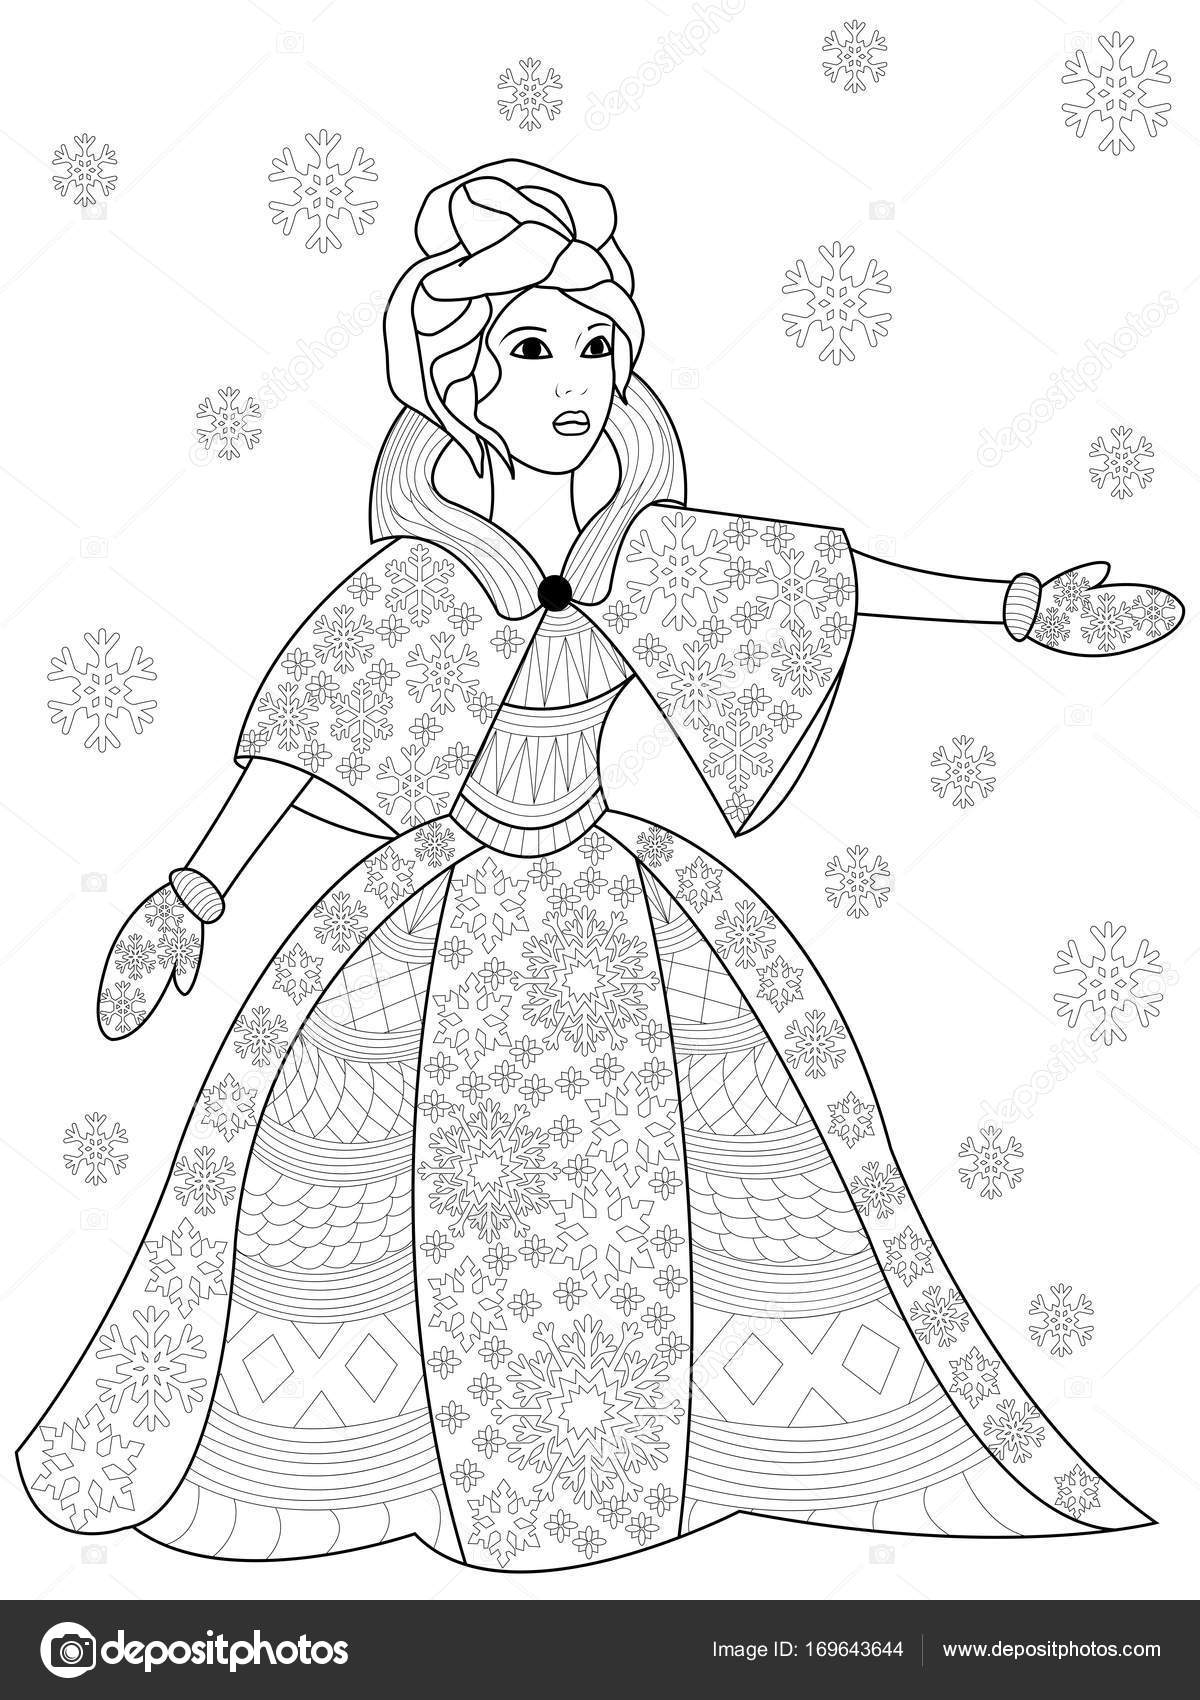 Kleurplaten Rond Winter.Kleurplaten Volwassenen Winter Woyaolu Info